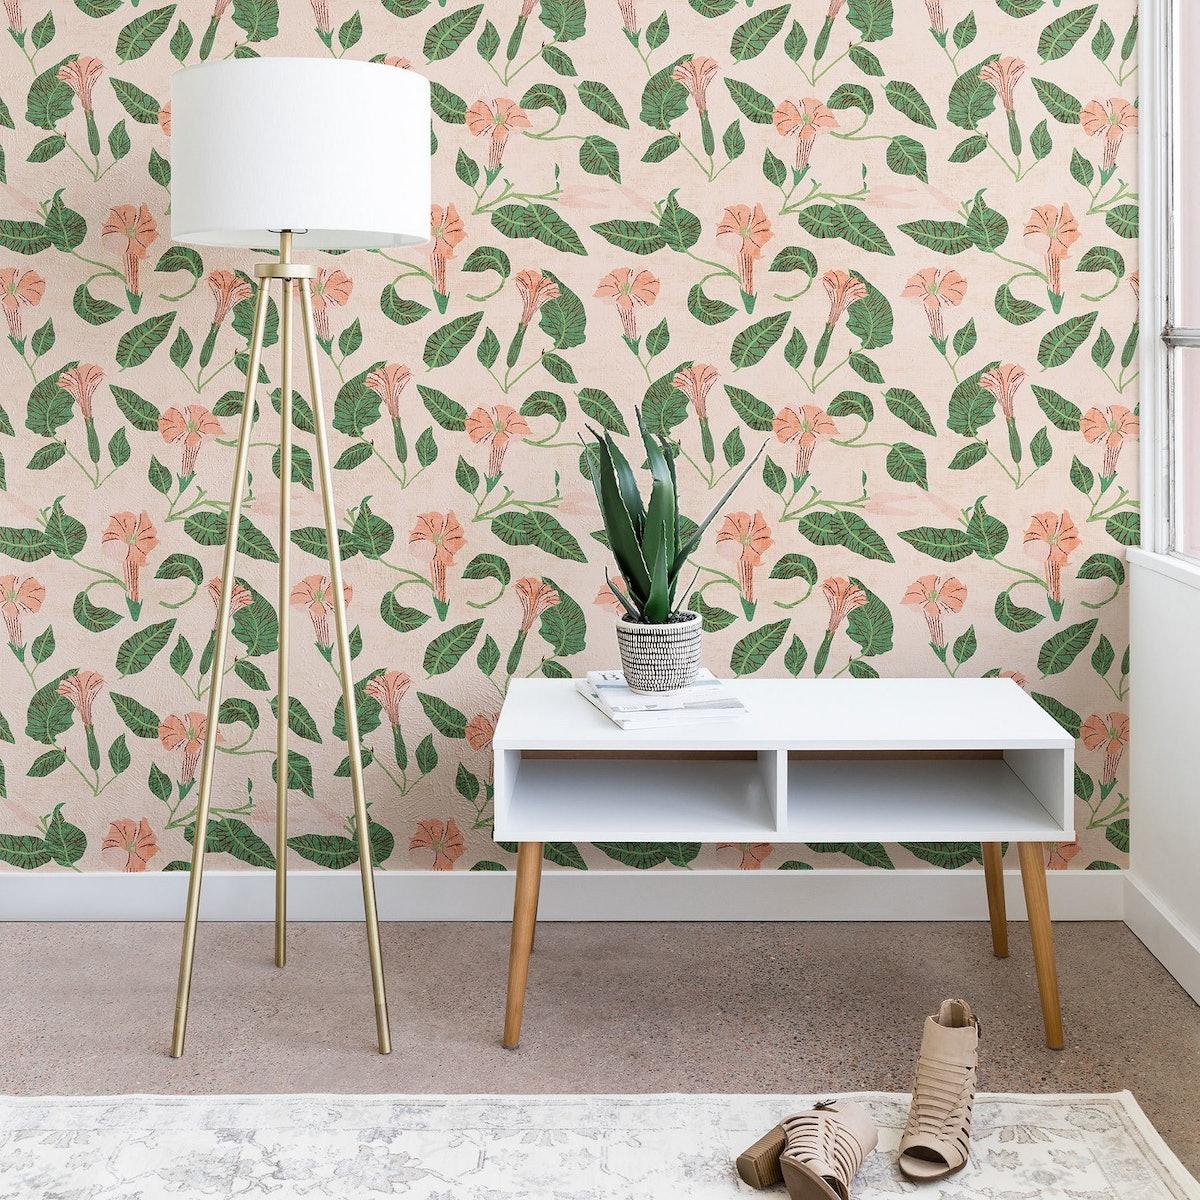 Holli Zollinger Desert Moonflower Wallpaper Pink - Deny Designs (2 feet x 4 feet)